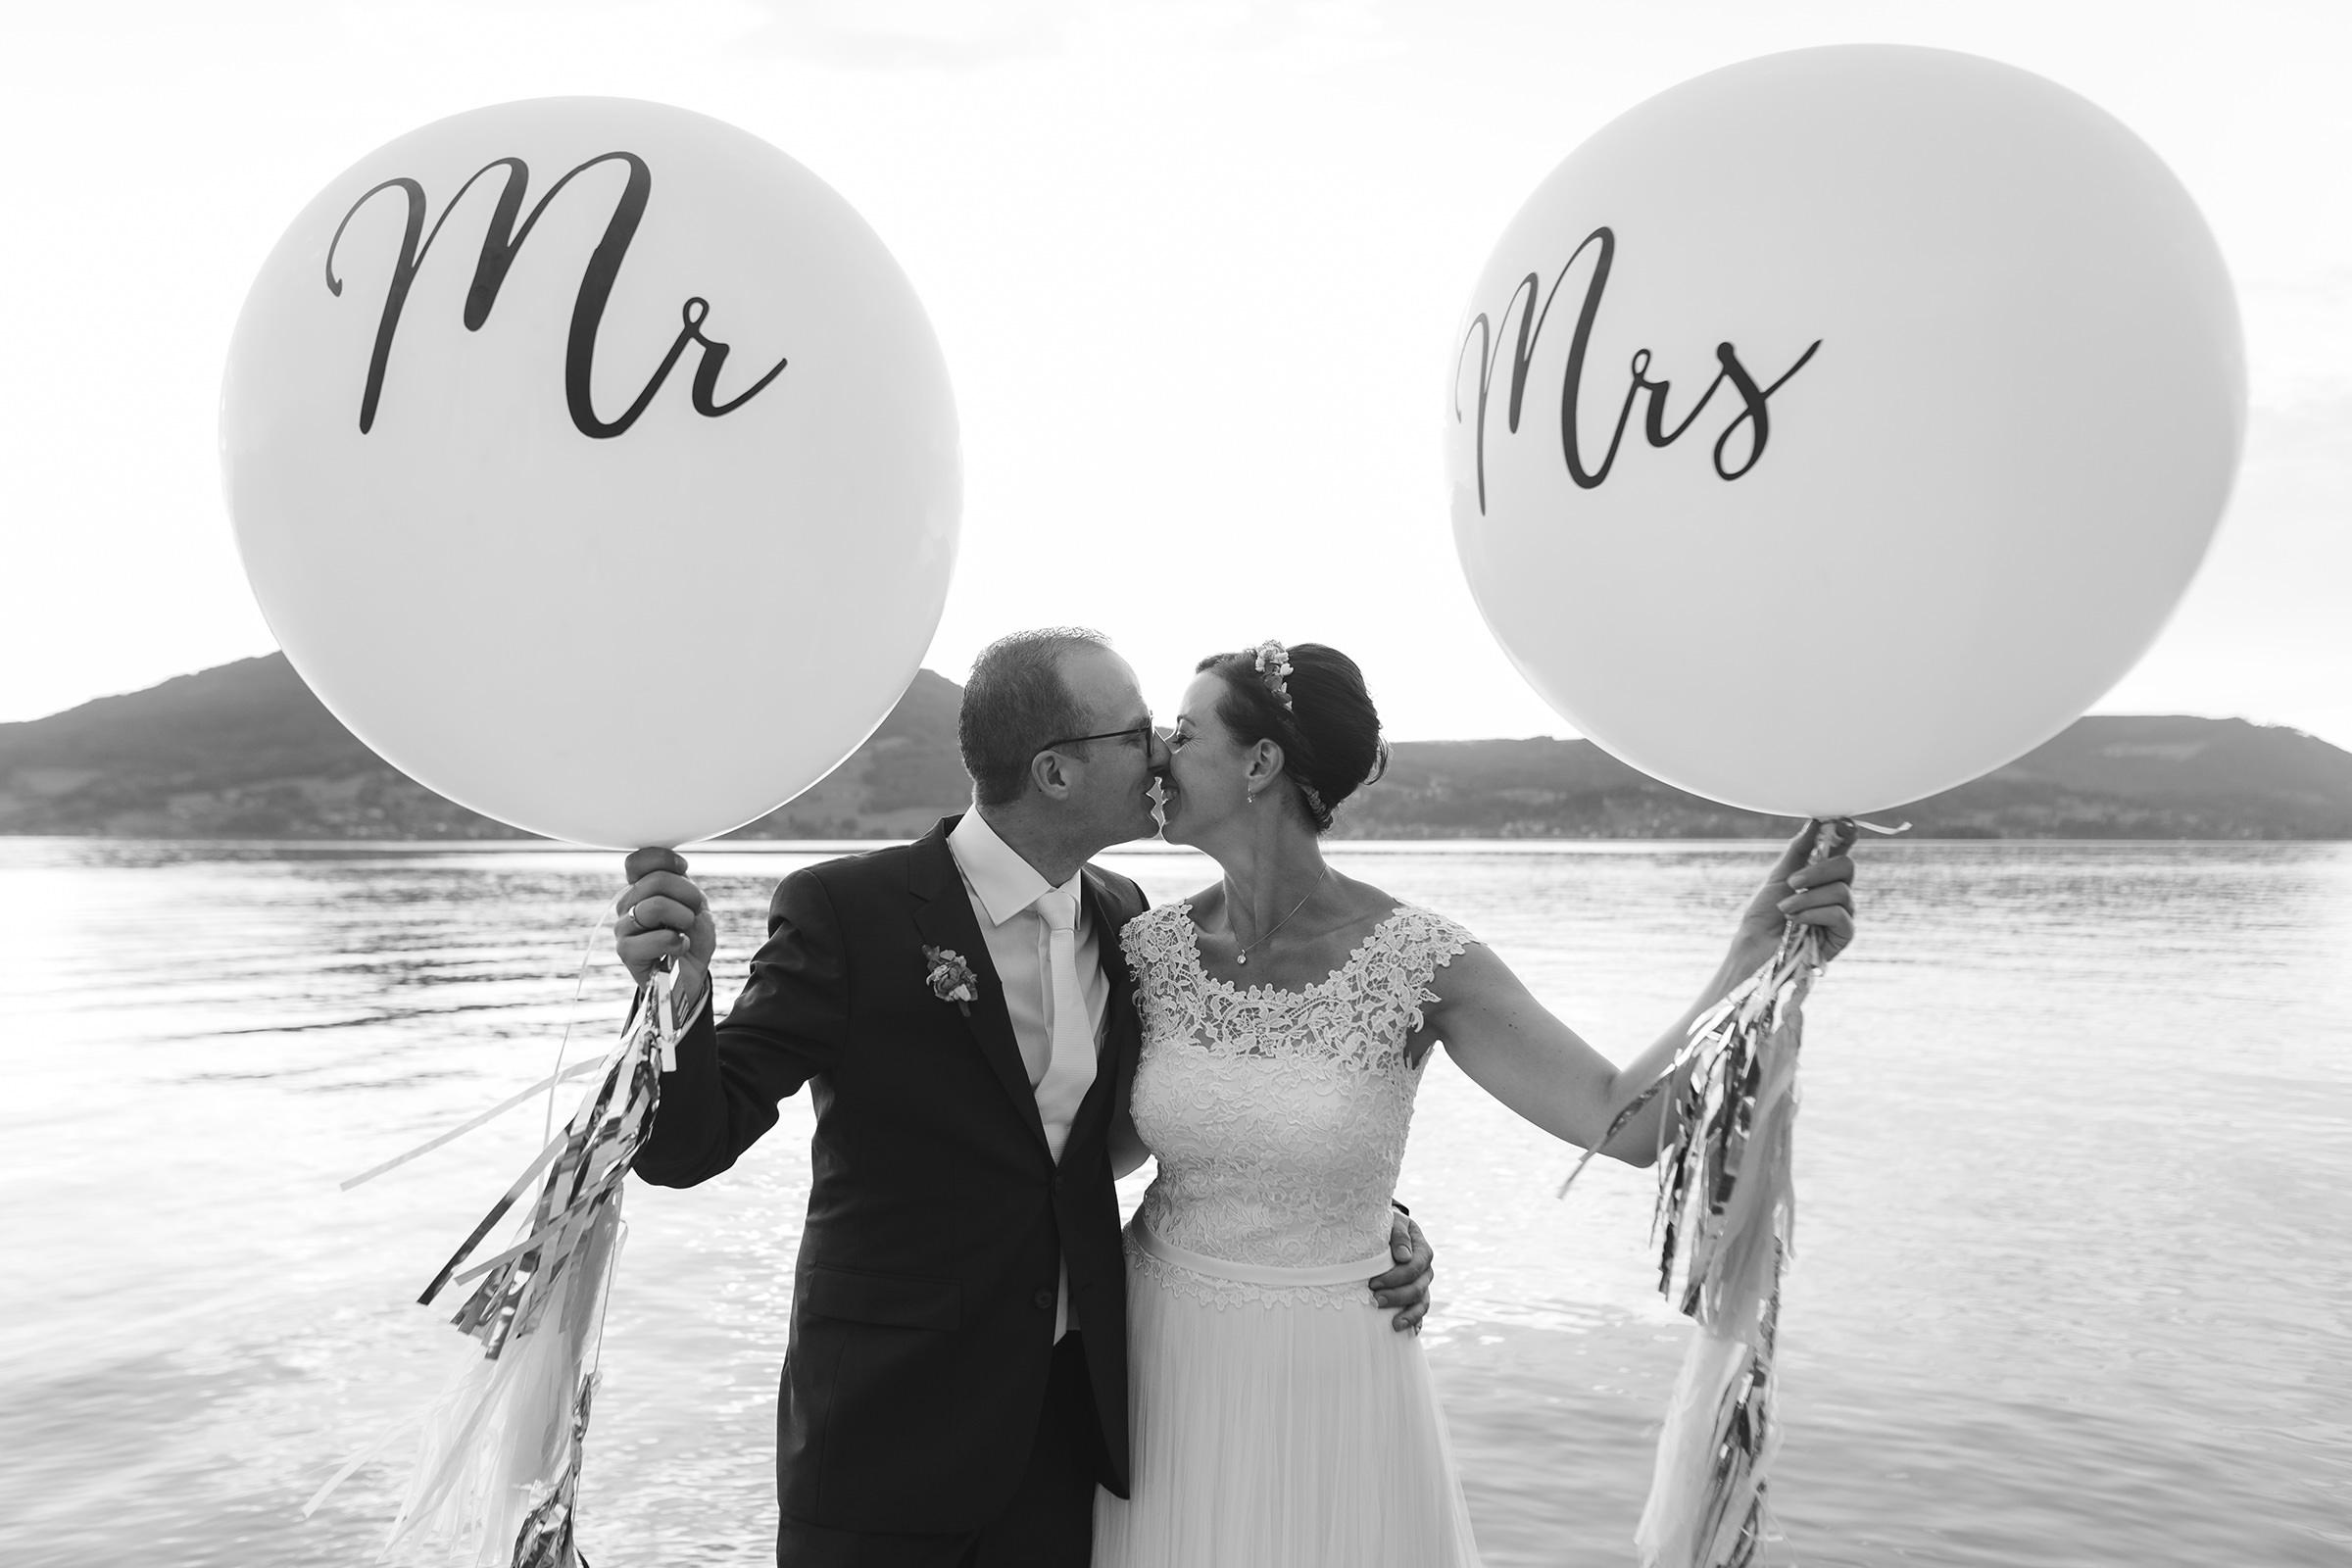 Brautpaar Attersee Luftballons Mr Mrs See